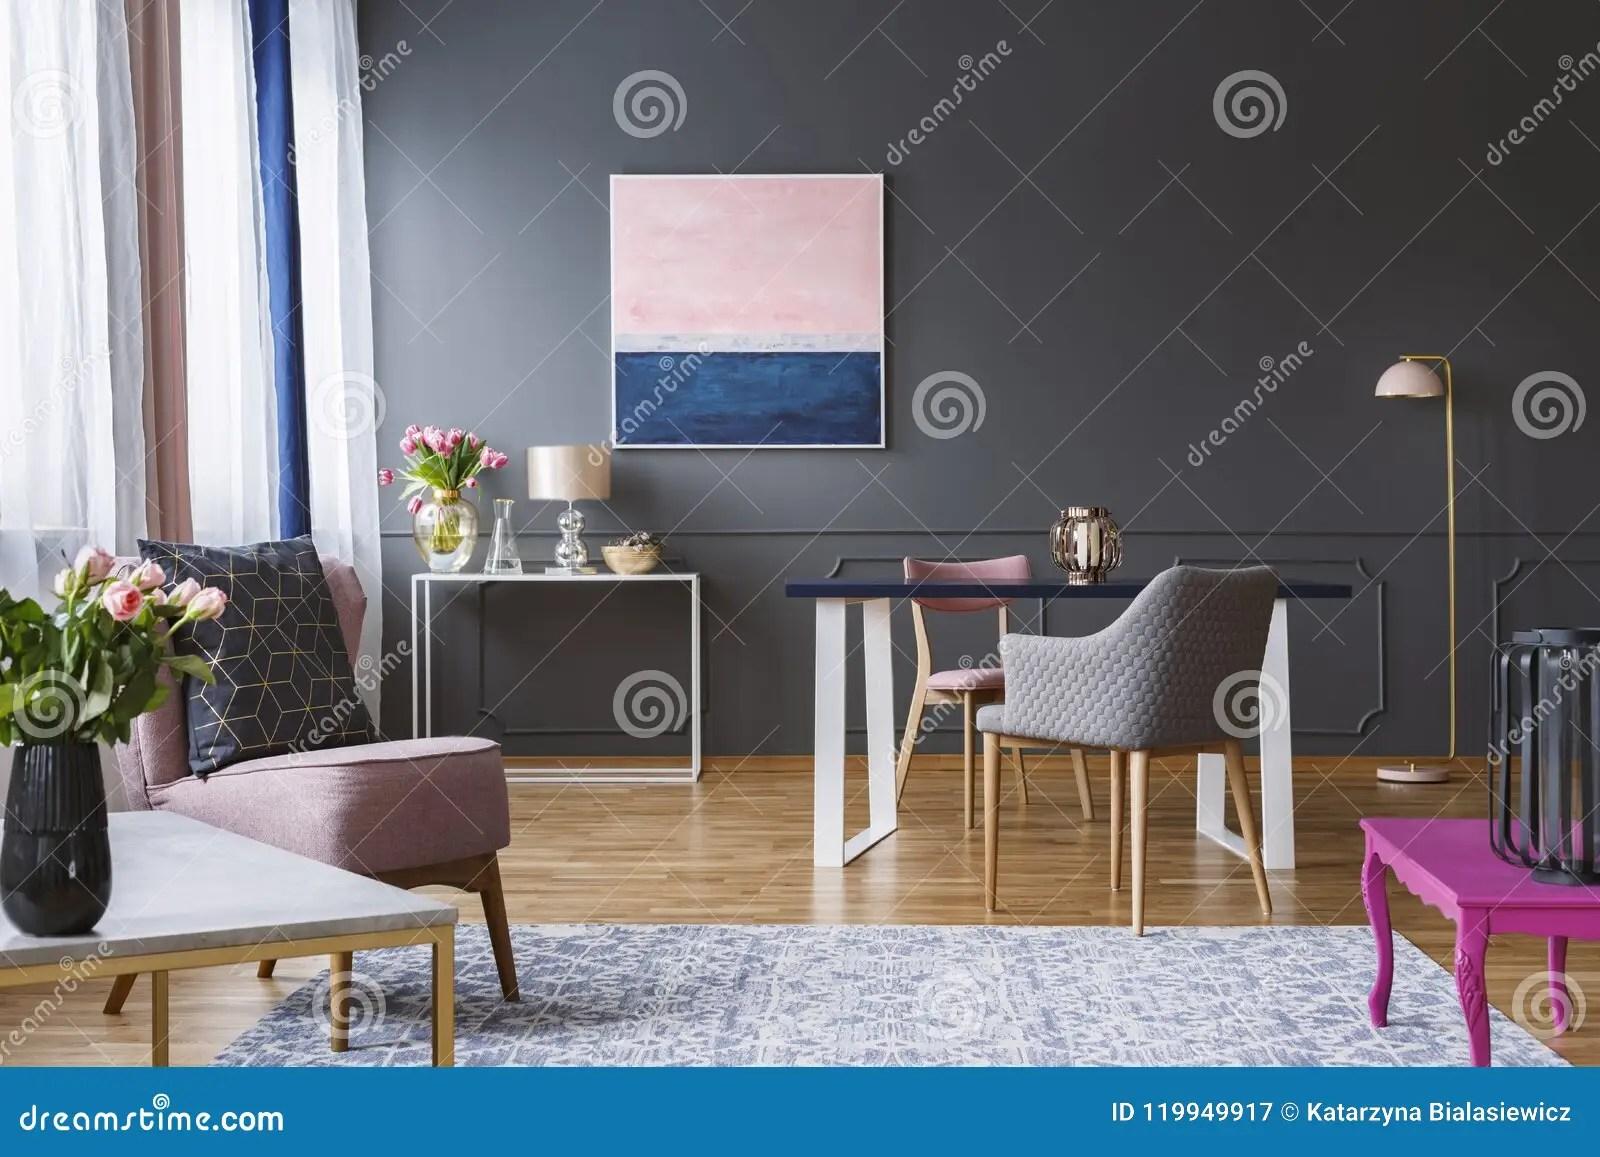 peinture de rose et de bleu marine dans